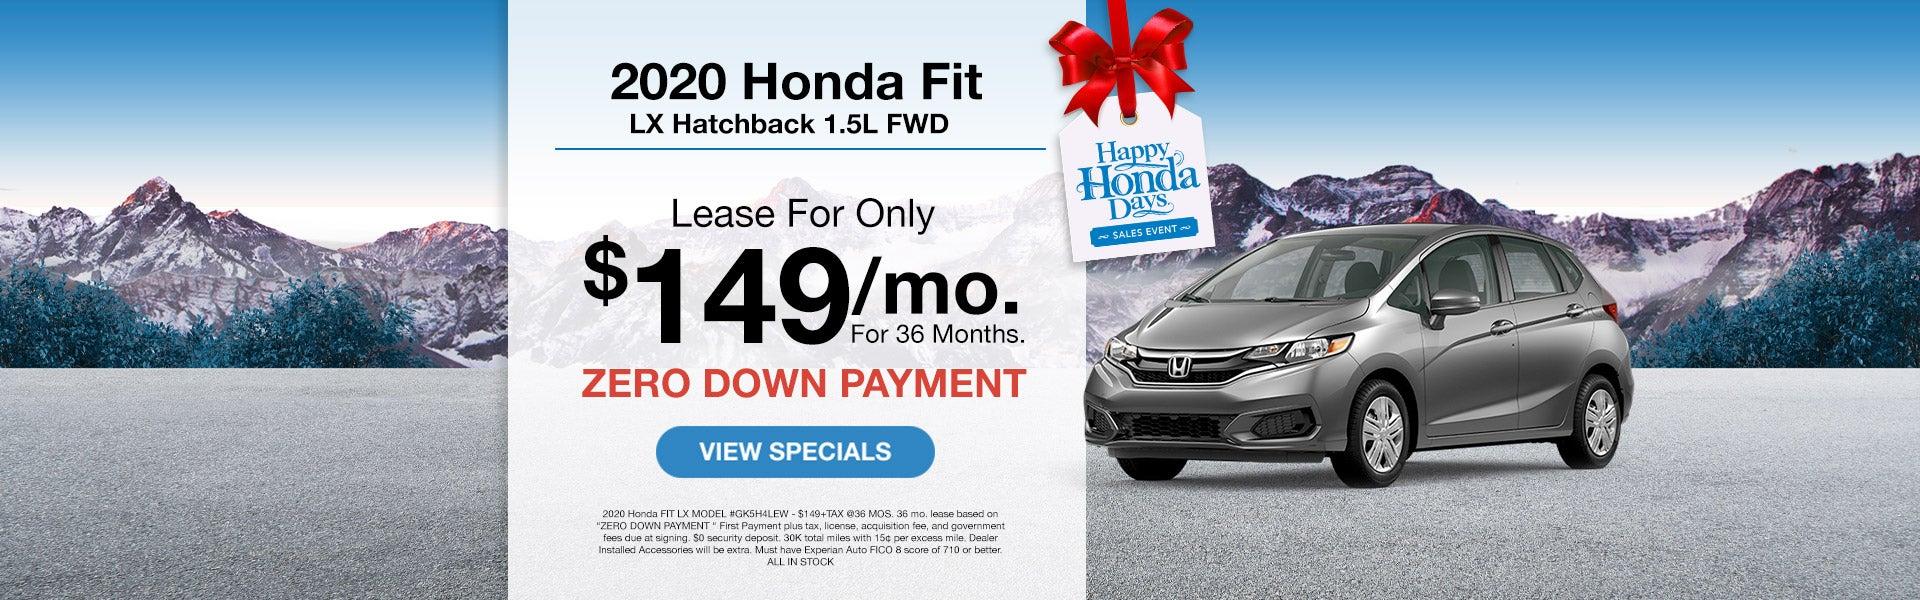 First Honda Of Simi Valley Honda Dealership In Simi Valley Ca